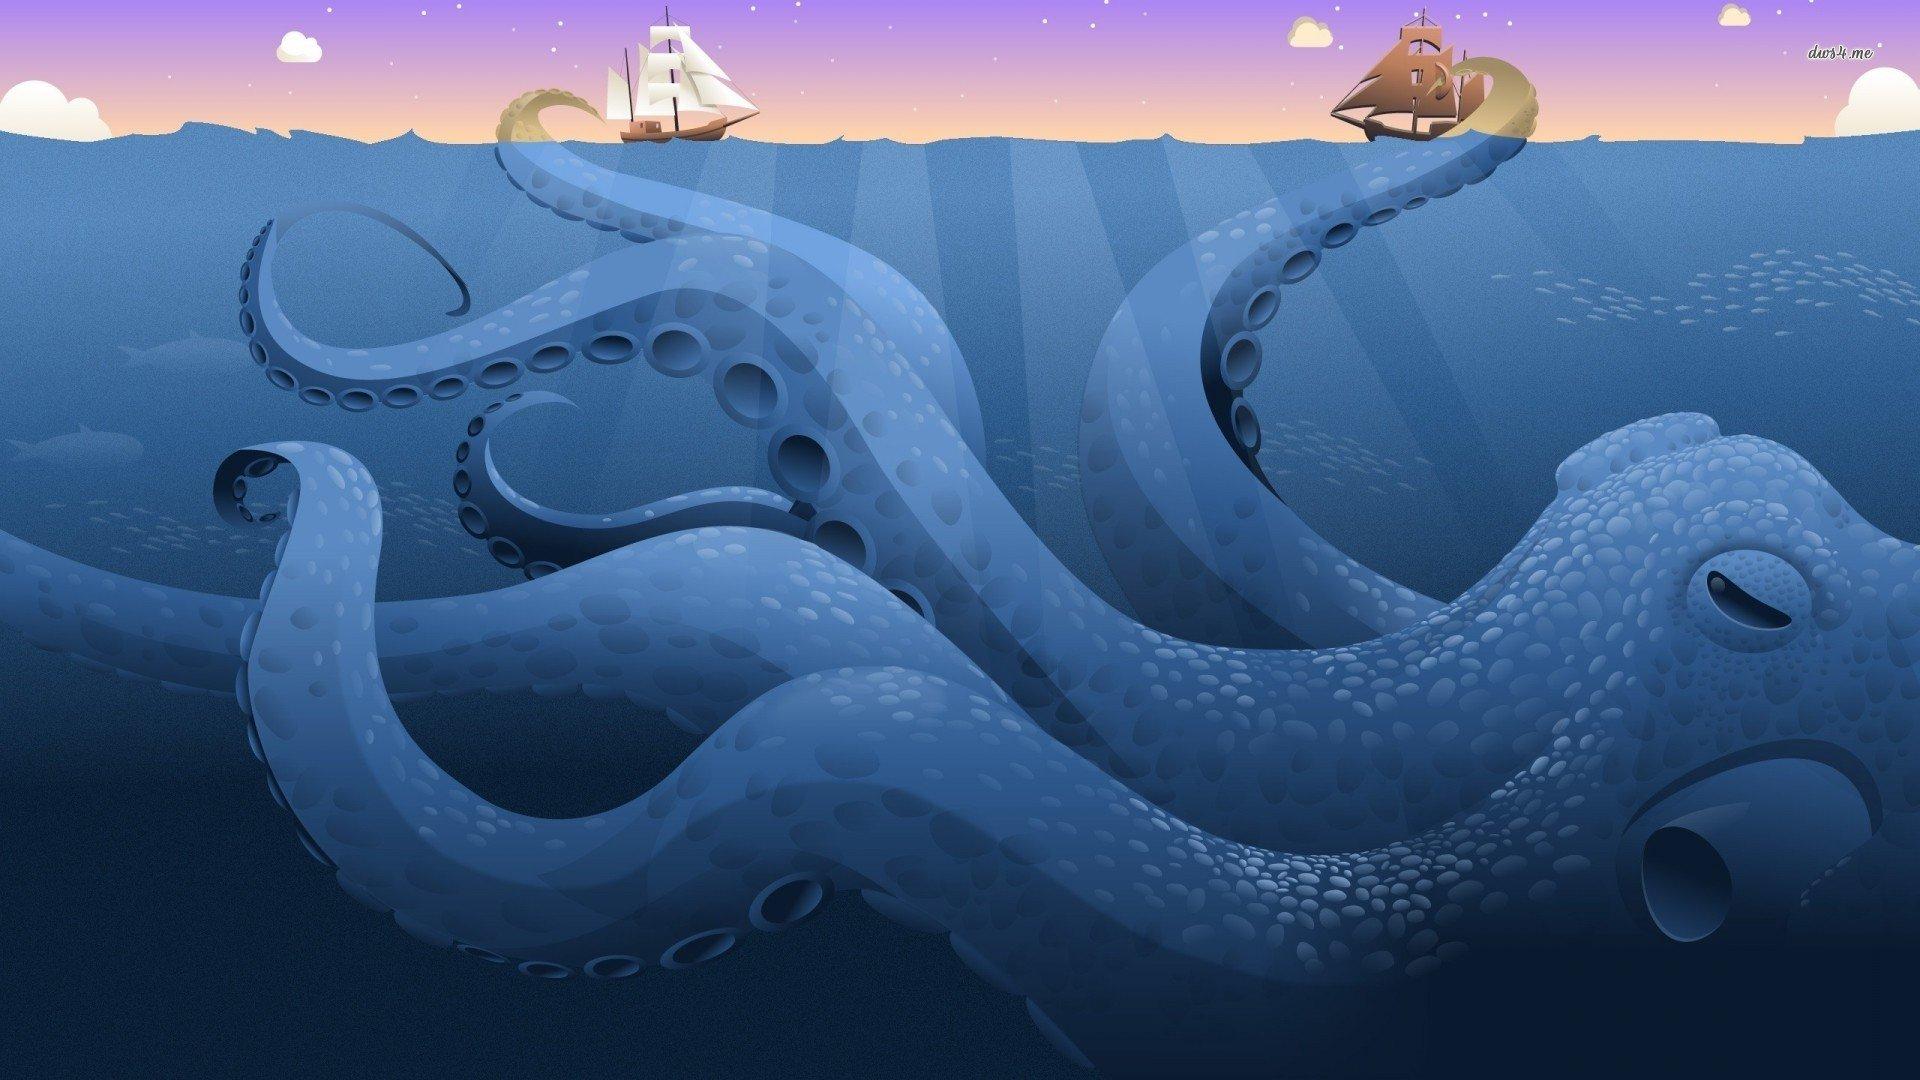 beautiful octopus wallpaper - photo #36